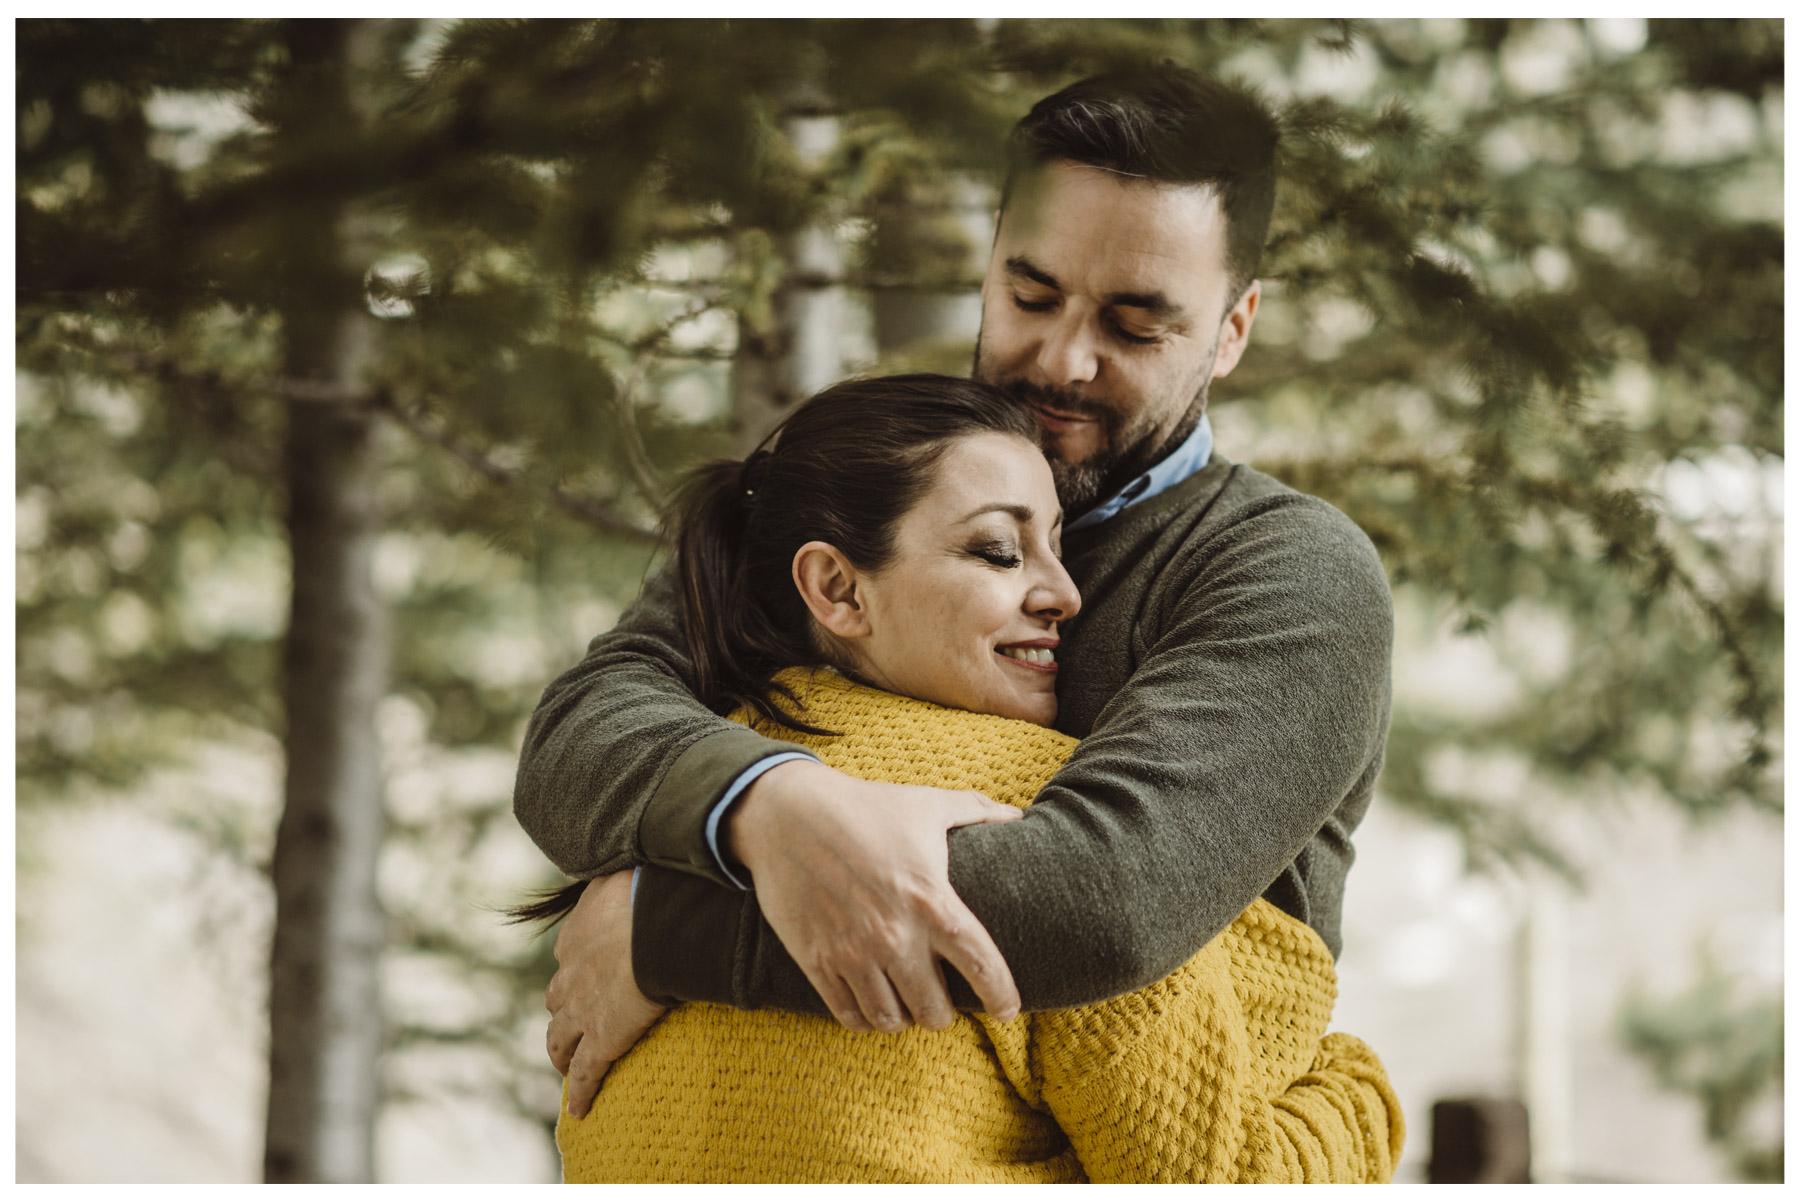 Preboda Sandra & Carlos - Jose - 056.jpg